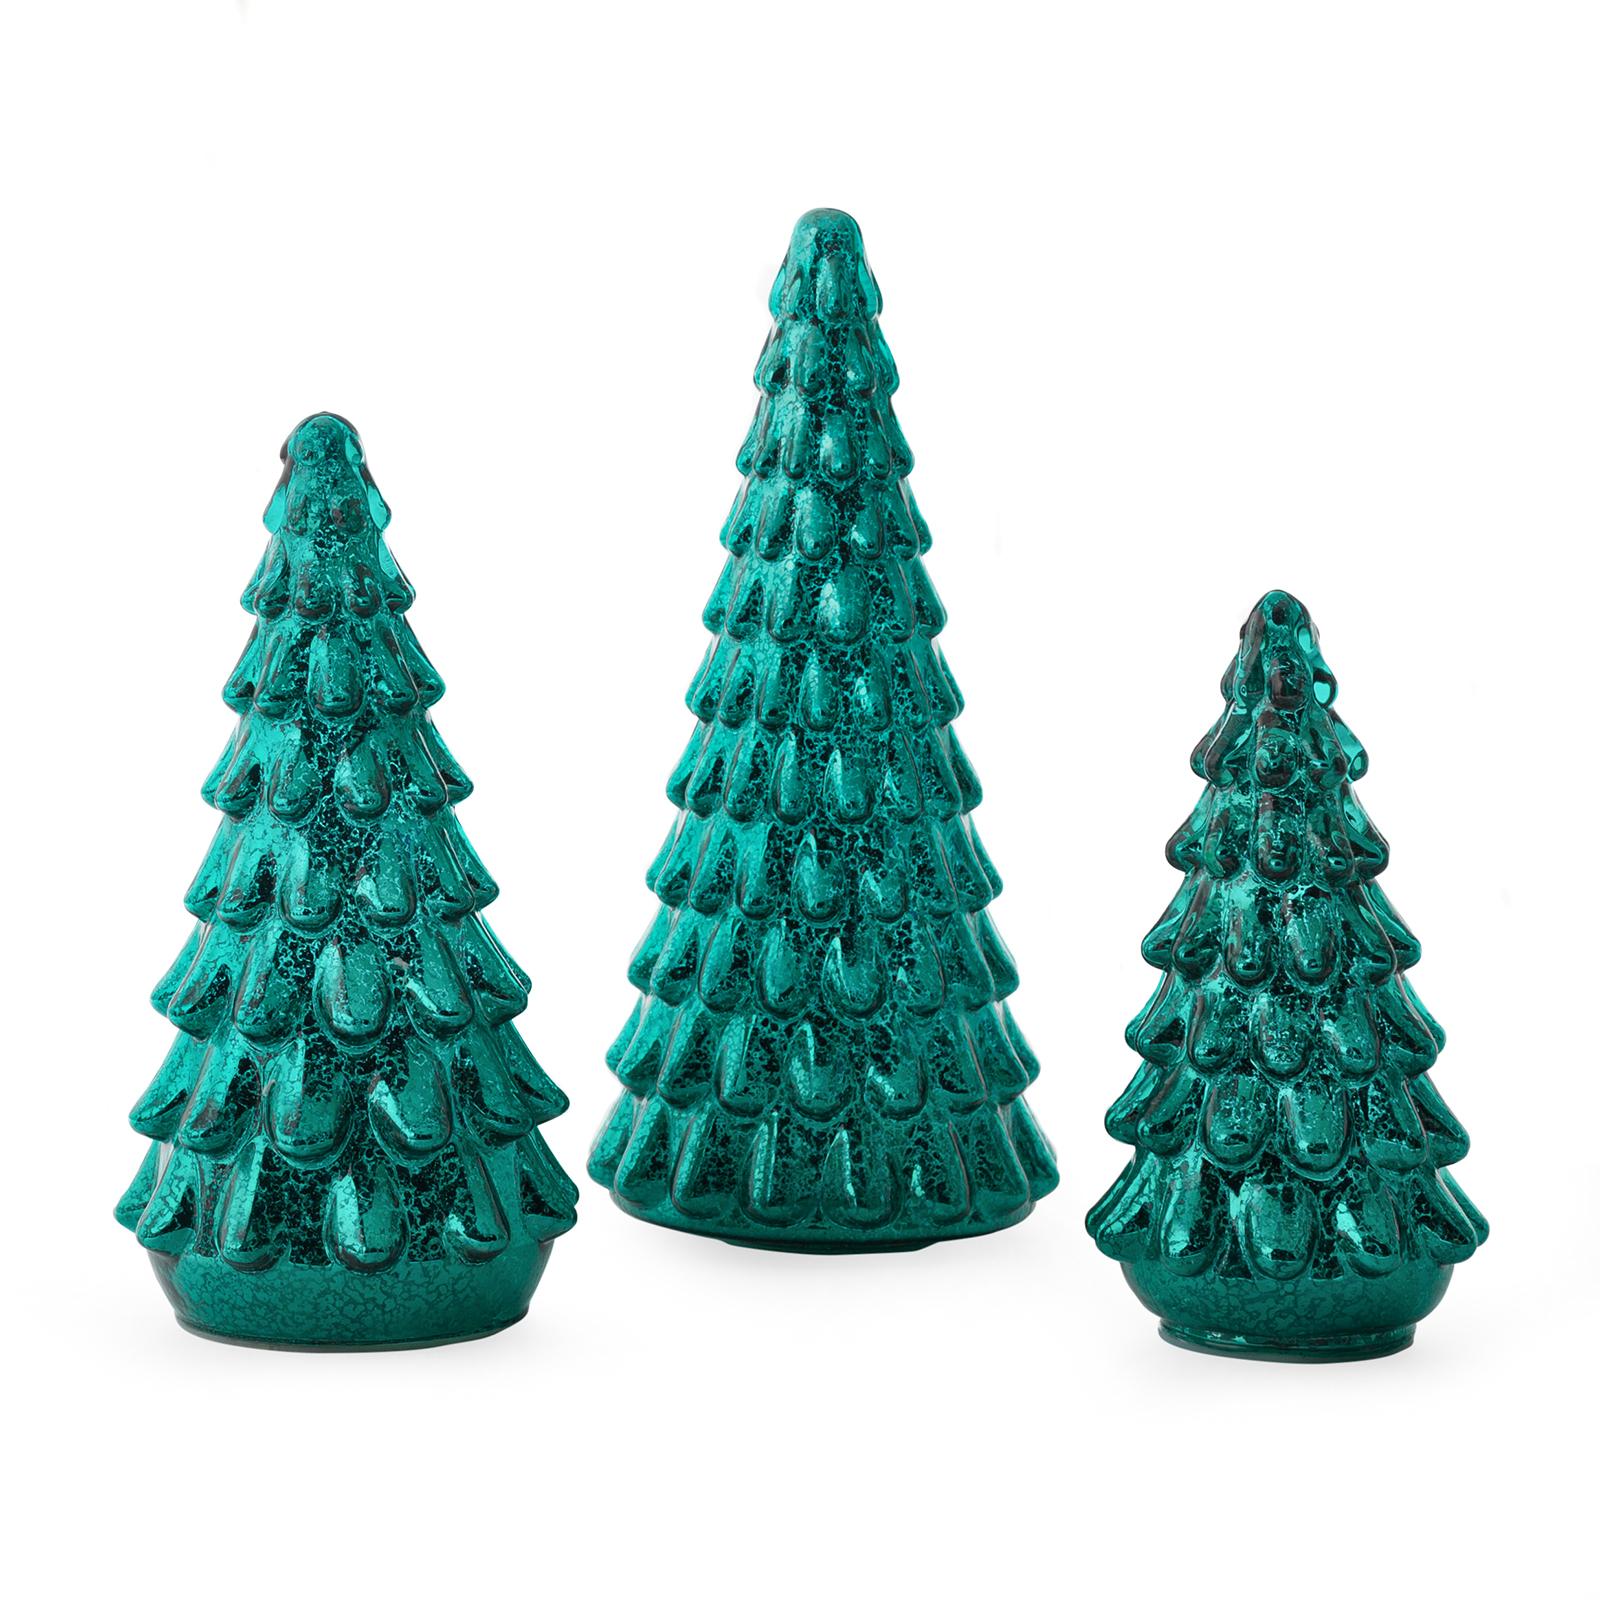 Belham Living Christmas Trees Mercury Glass Set of 3, Green